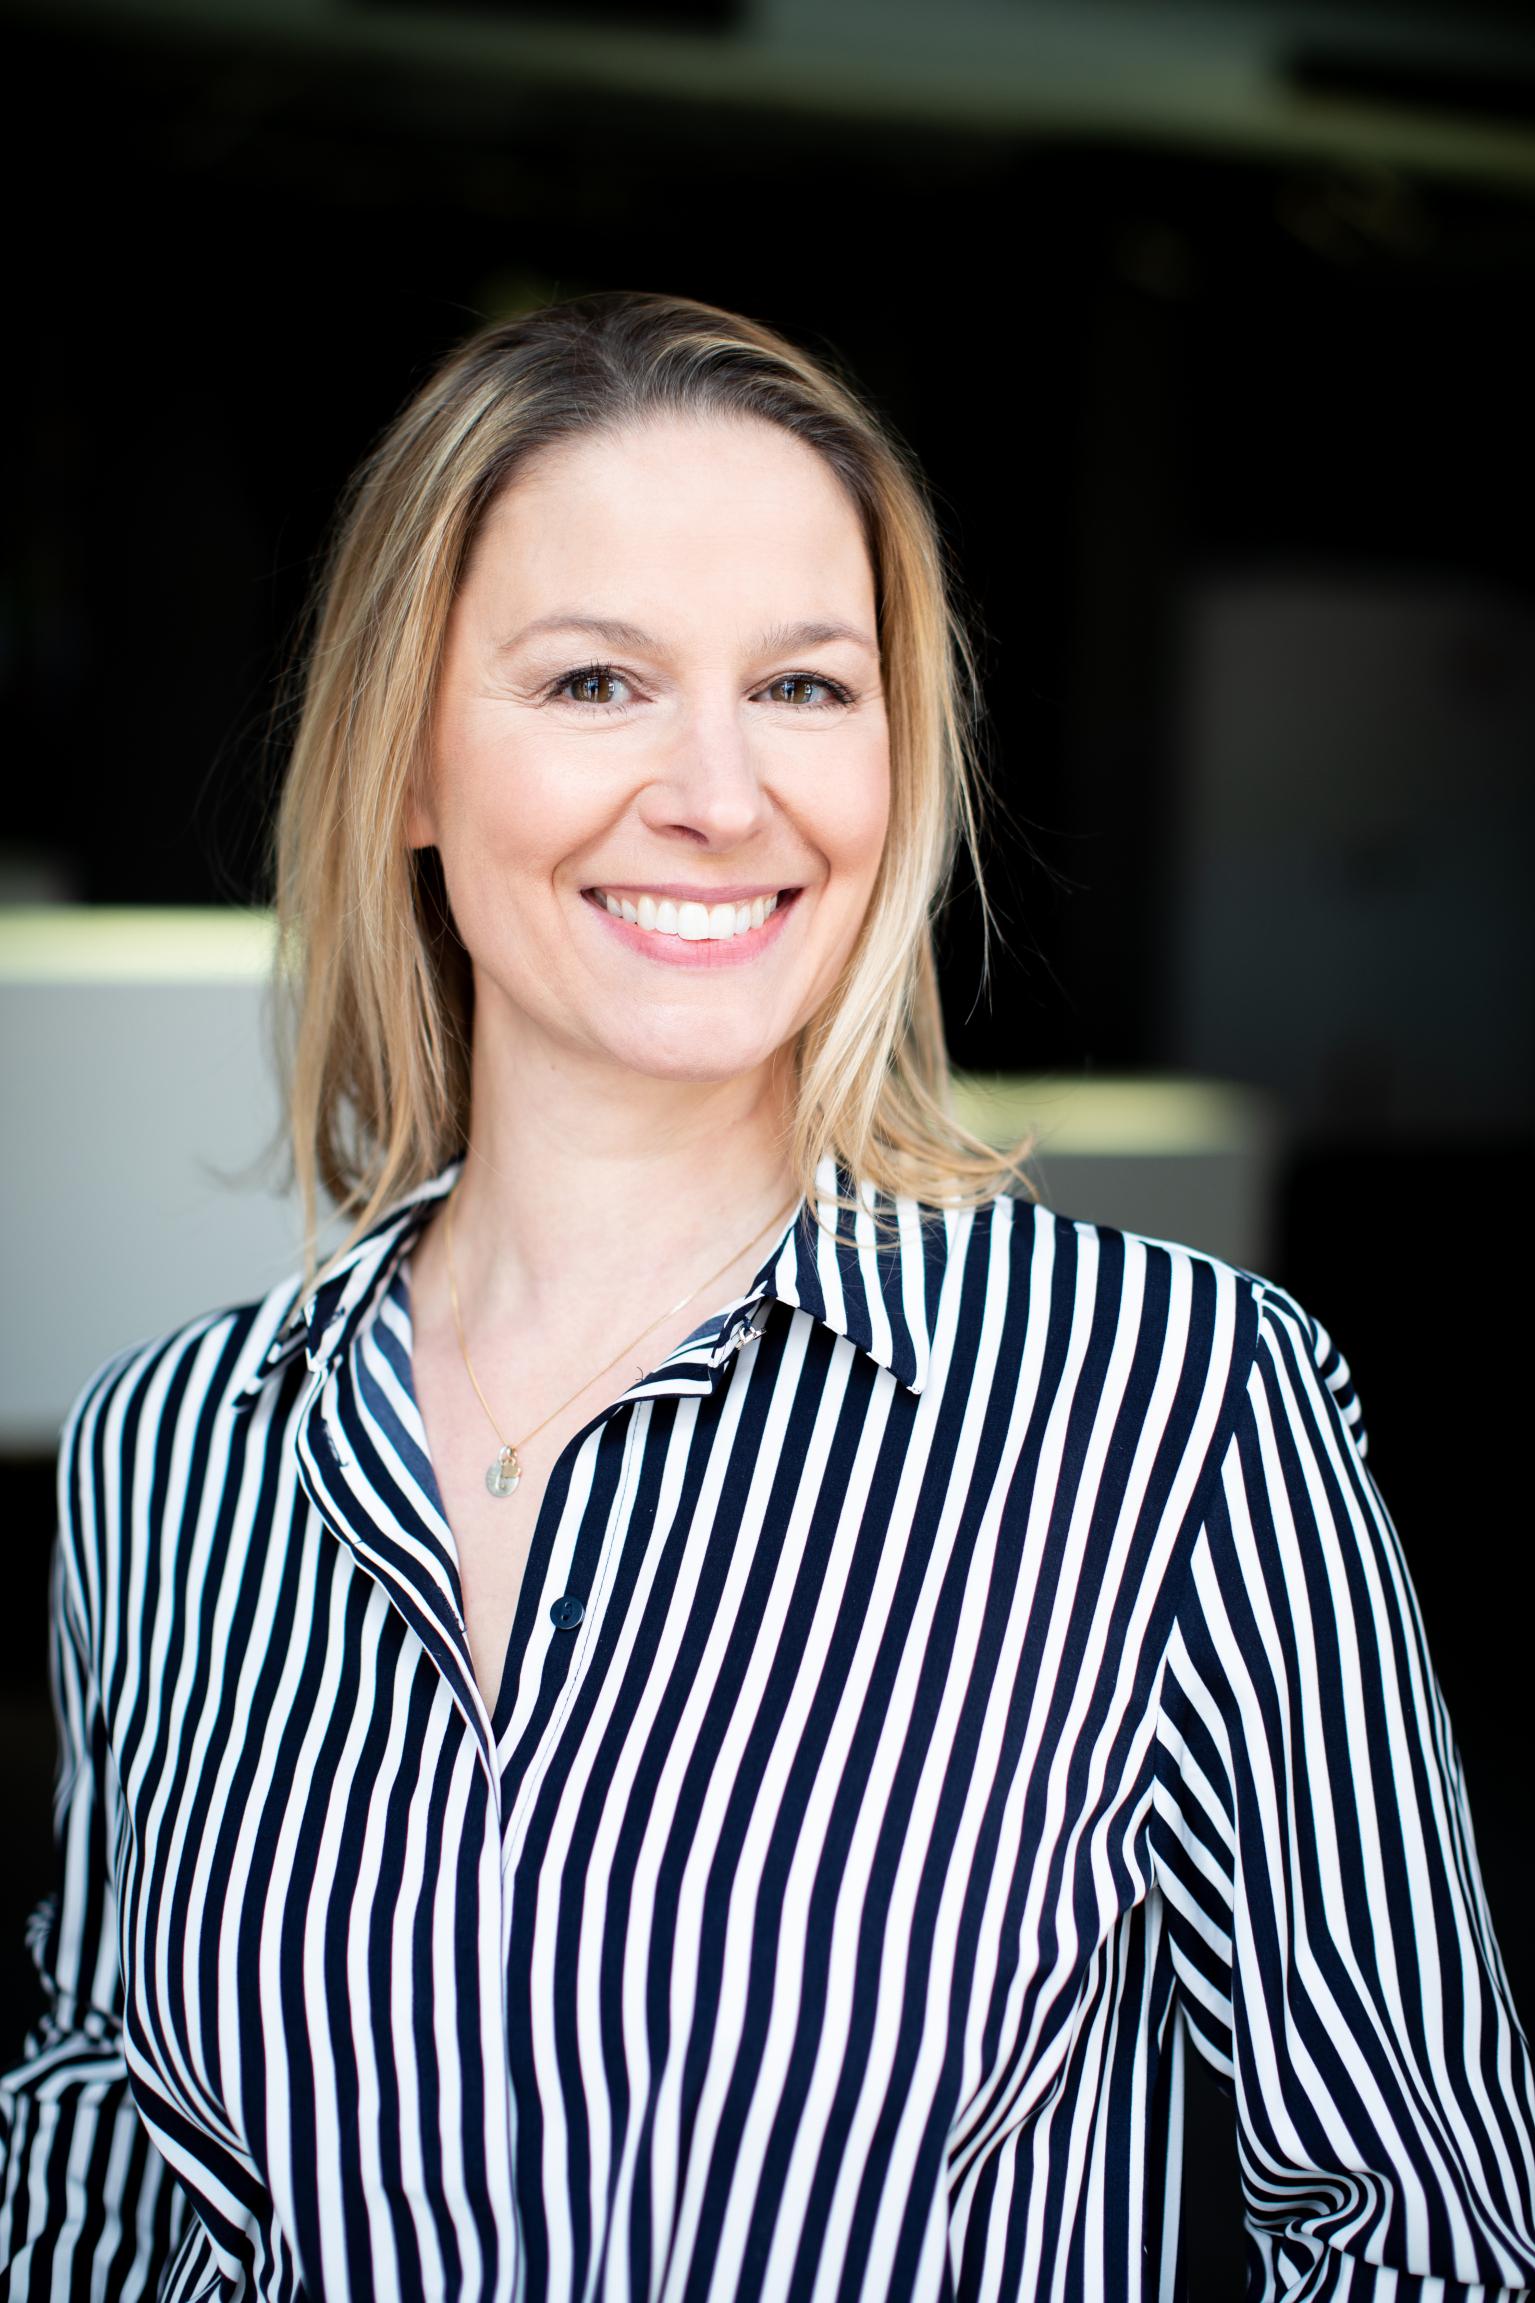 Christina Beyerhaus